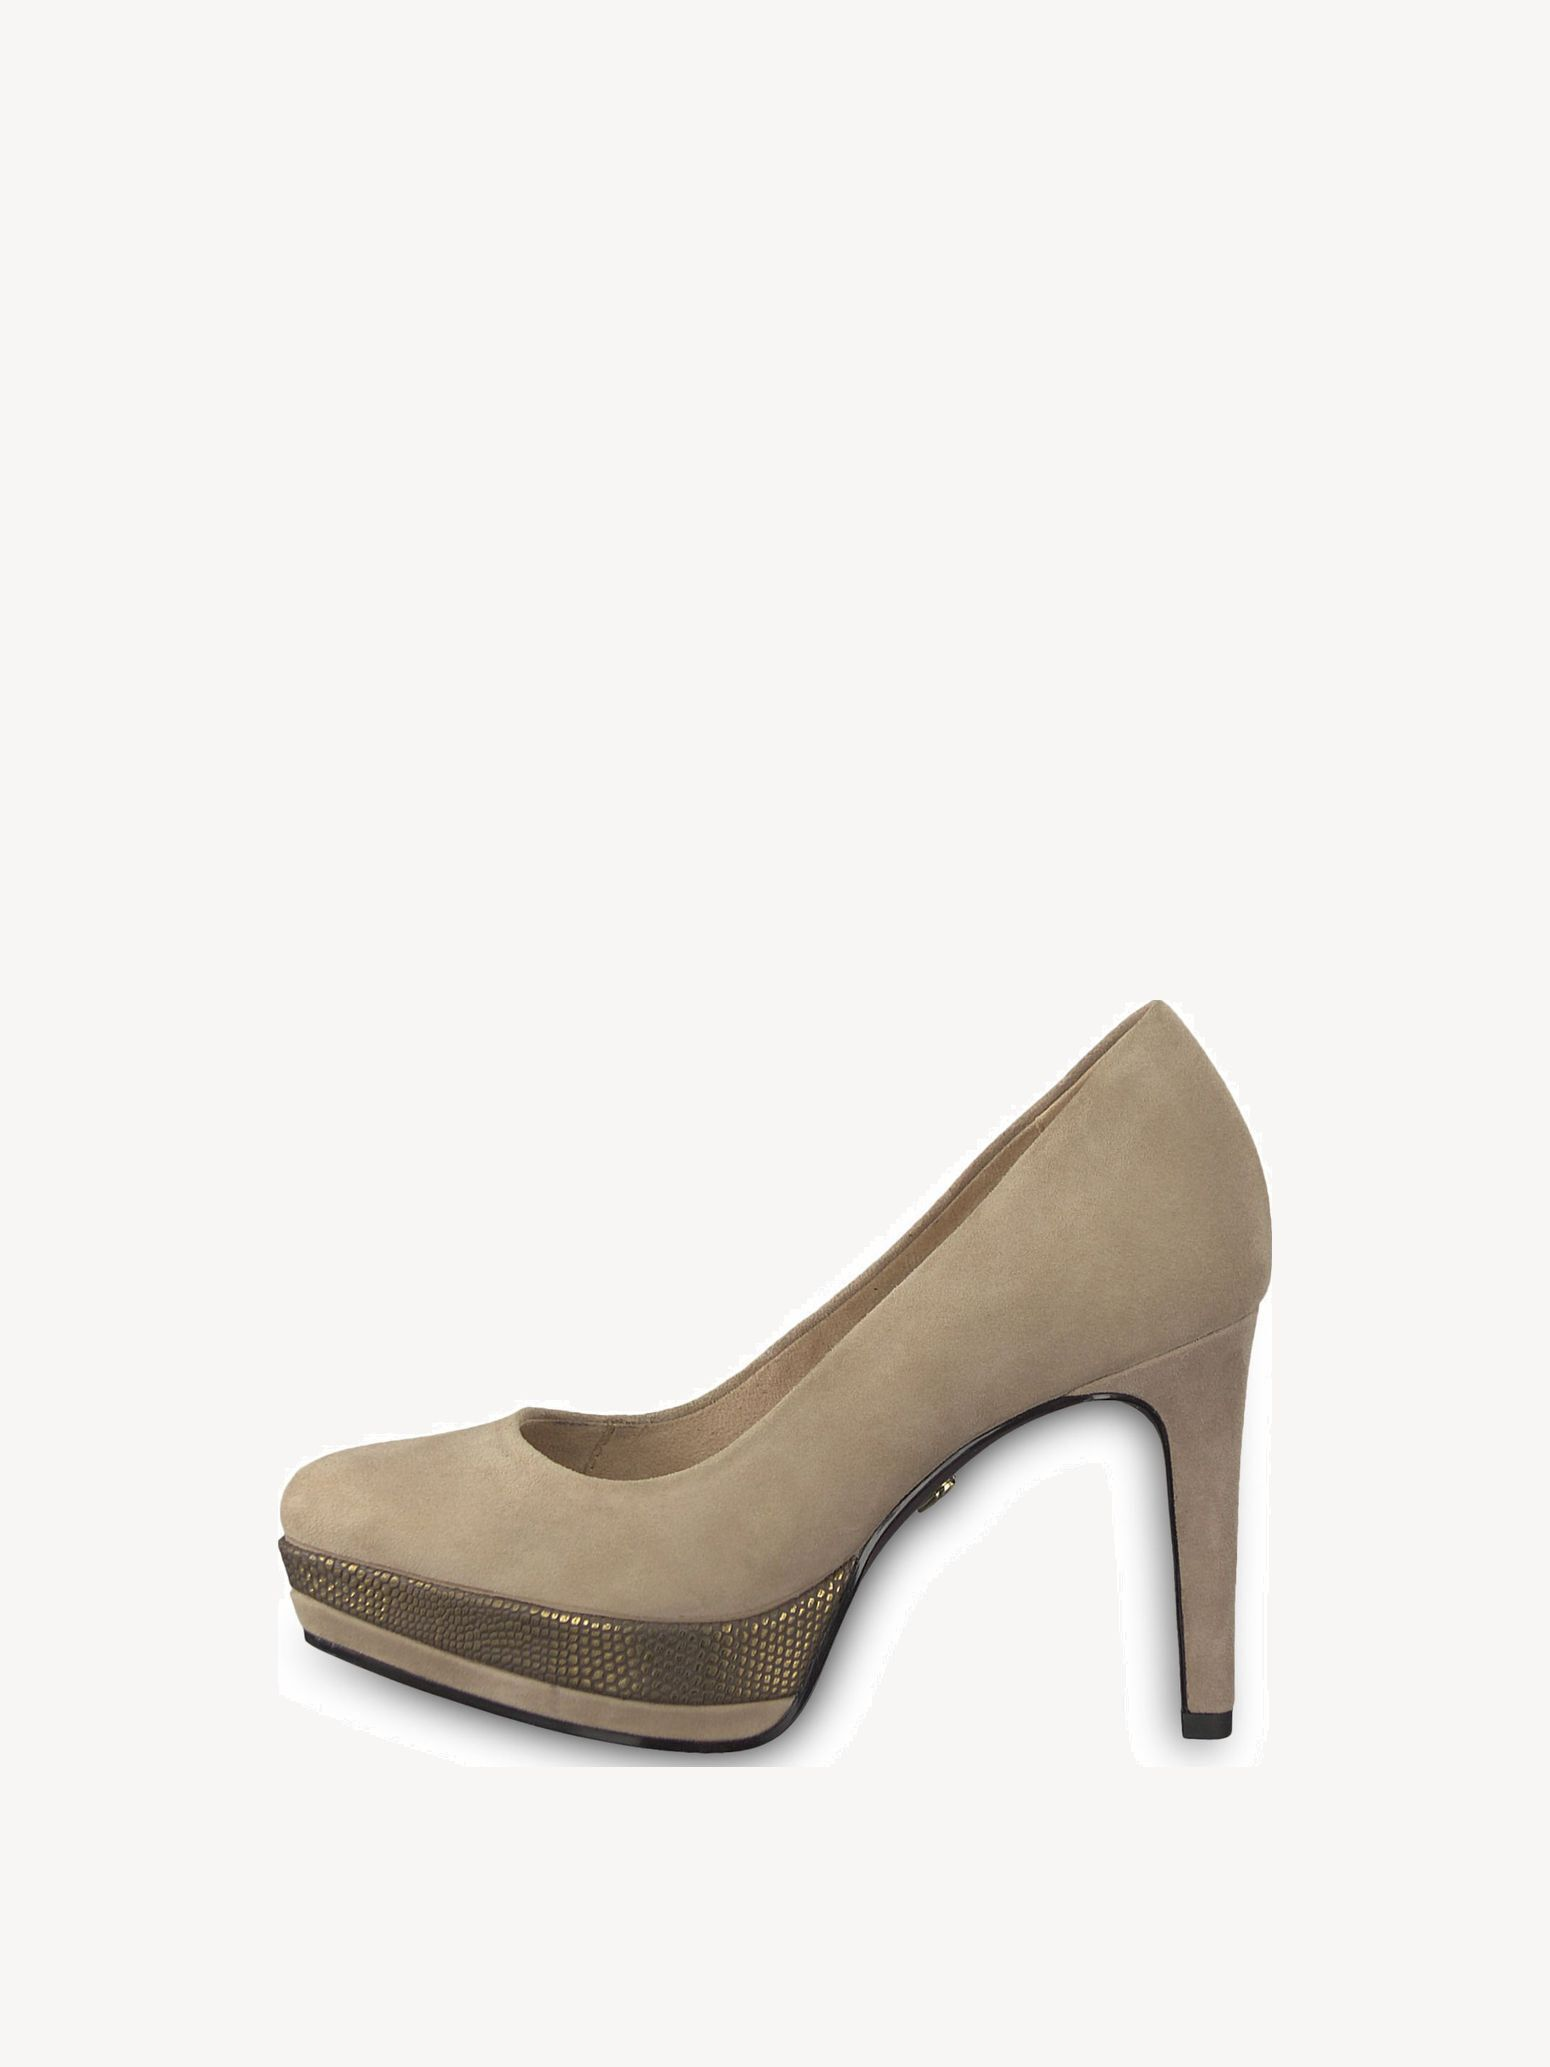 Leather High Heel